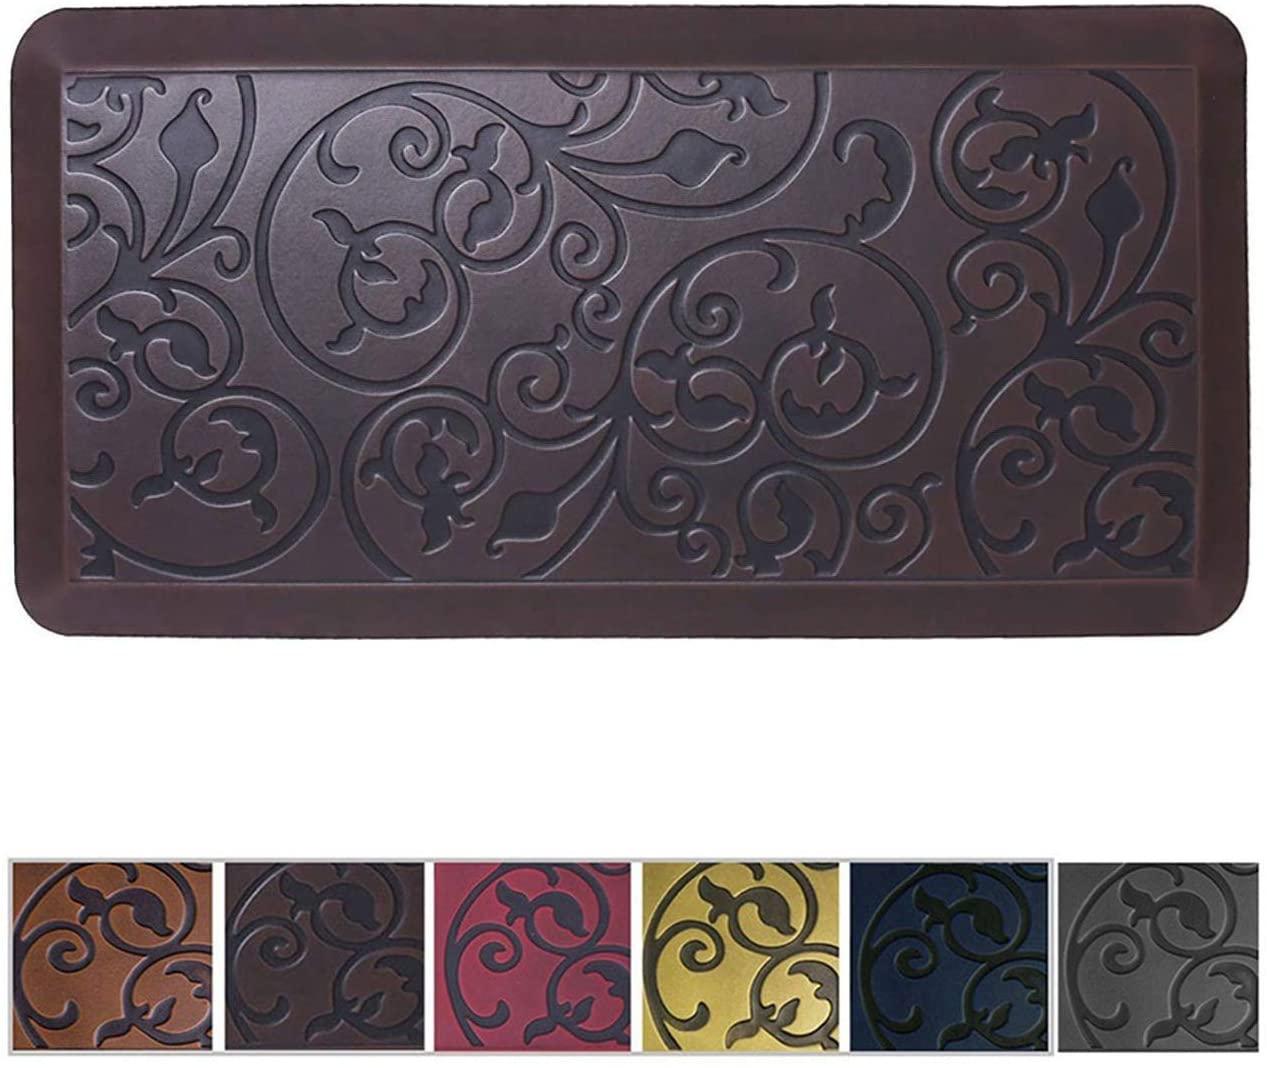 Amcomfy Premium Kitchen Anti Fatigue Mat,Comfort Floor Mats,Standing Mats,Antique Series (20 x 39 x 3/4 Inches, Antique Dark)